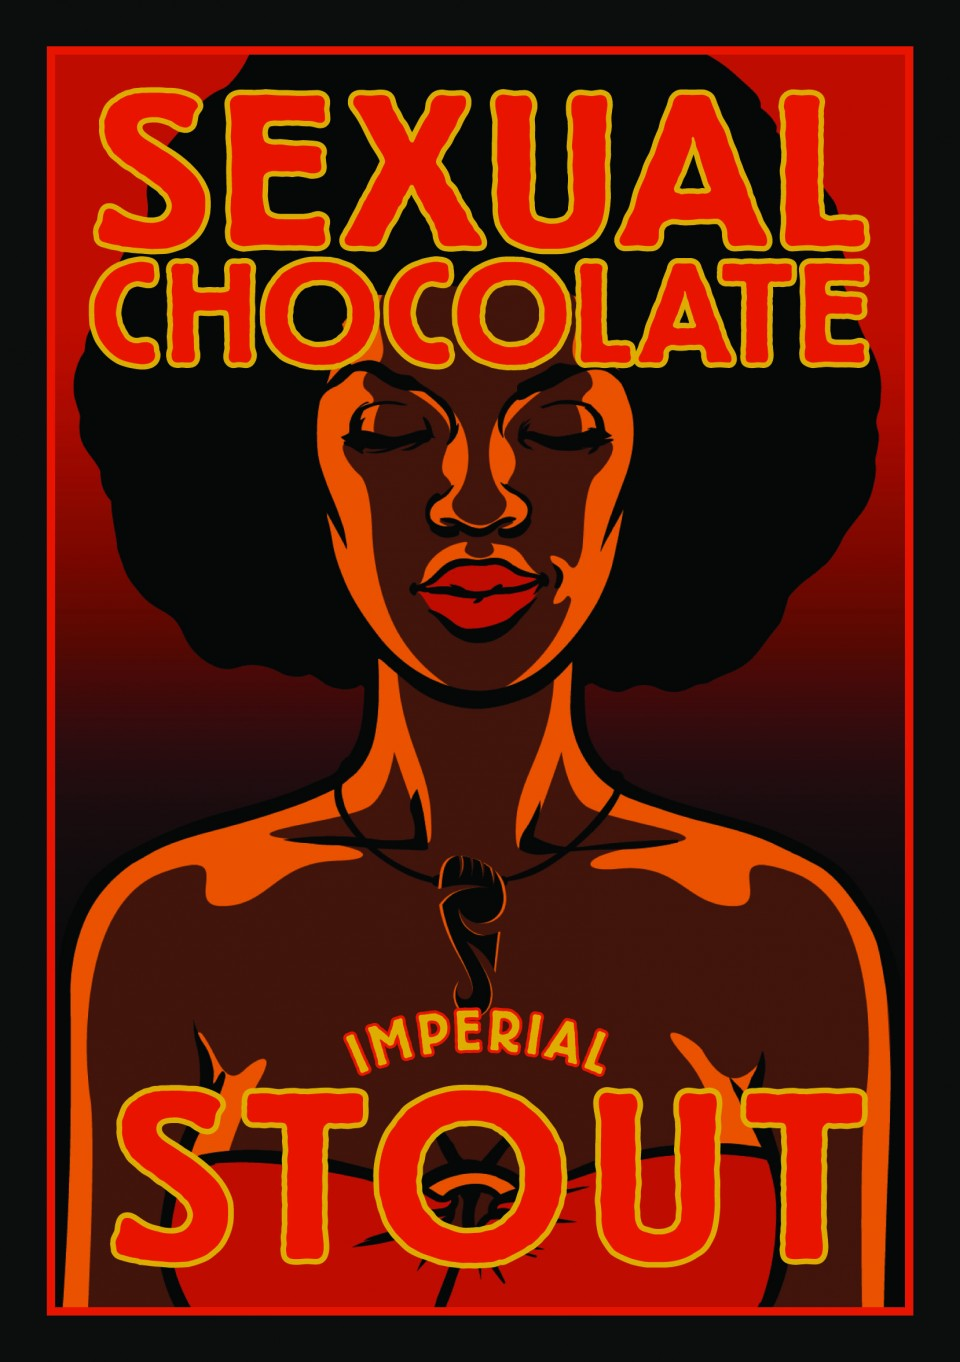 Foothills Sexual Chocolate Hi Rez